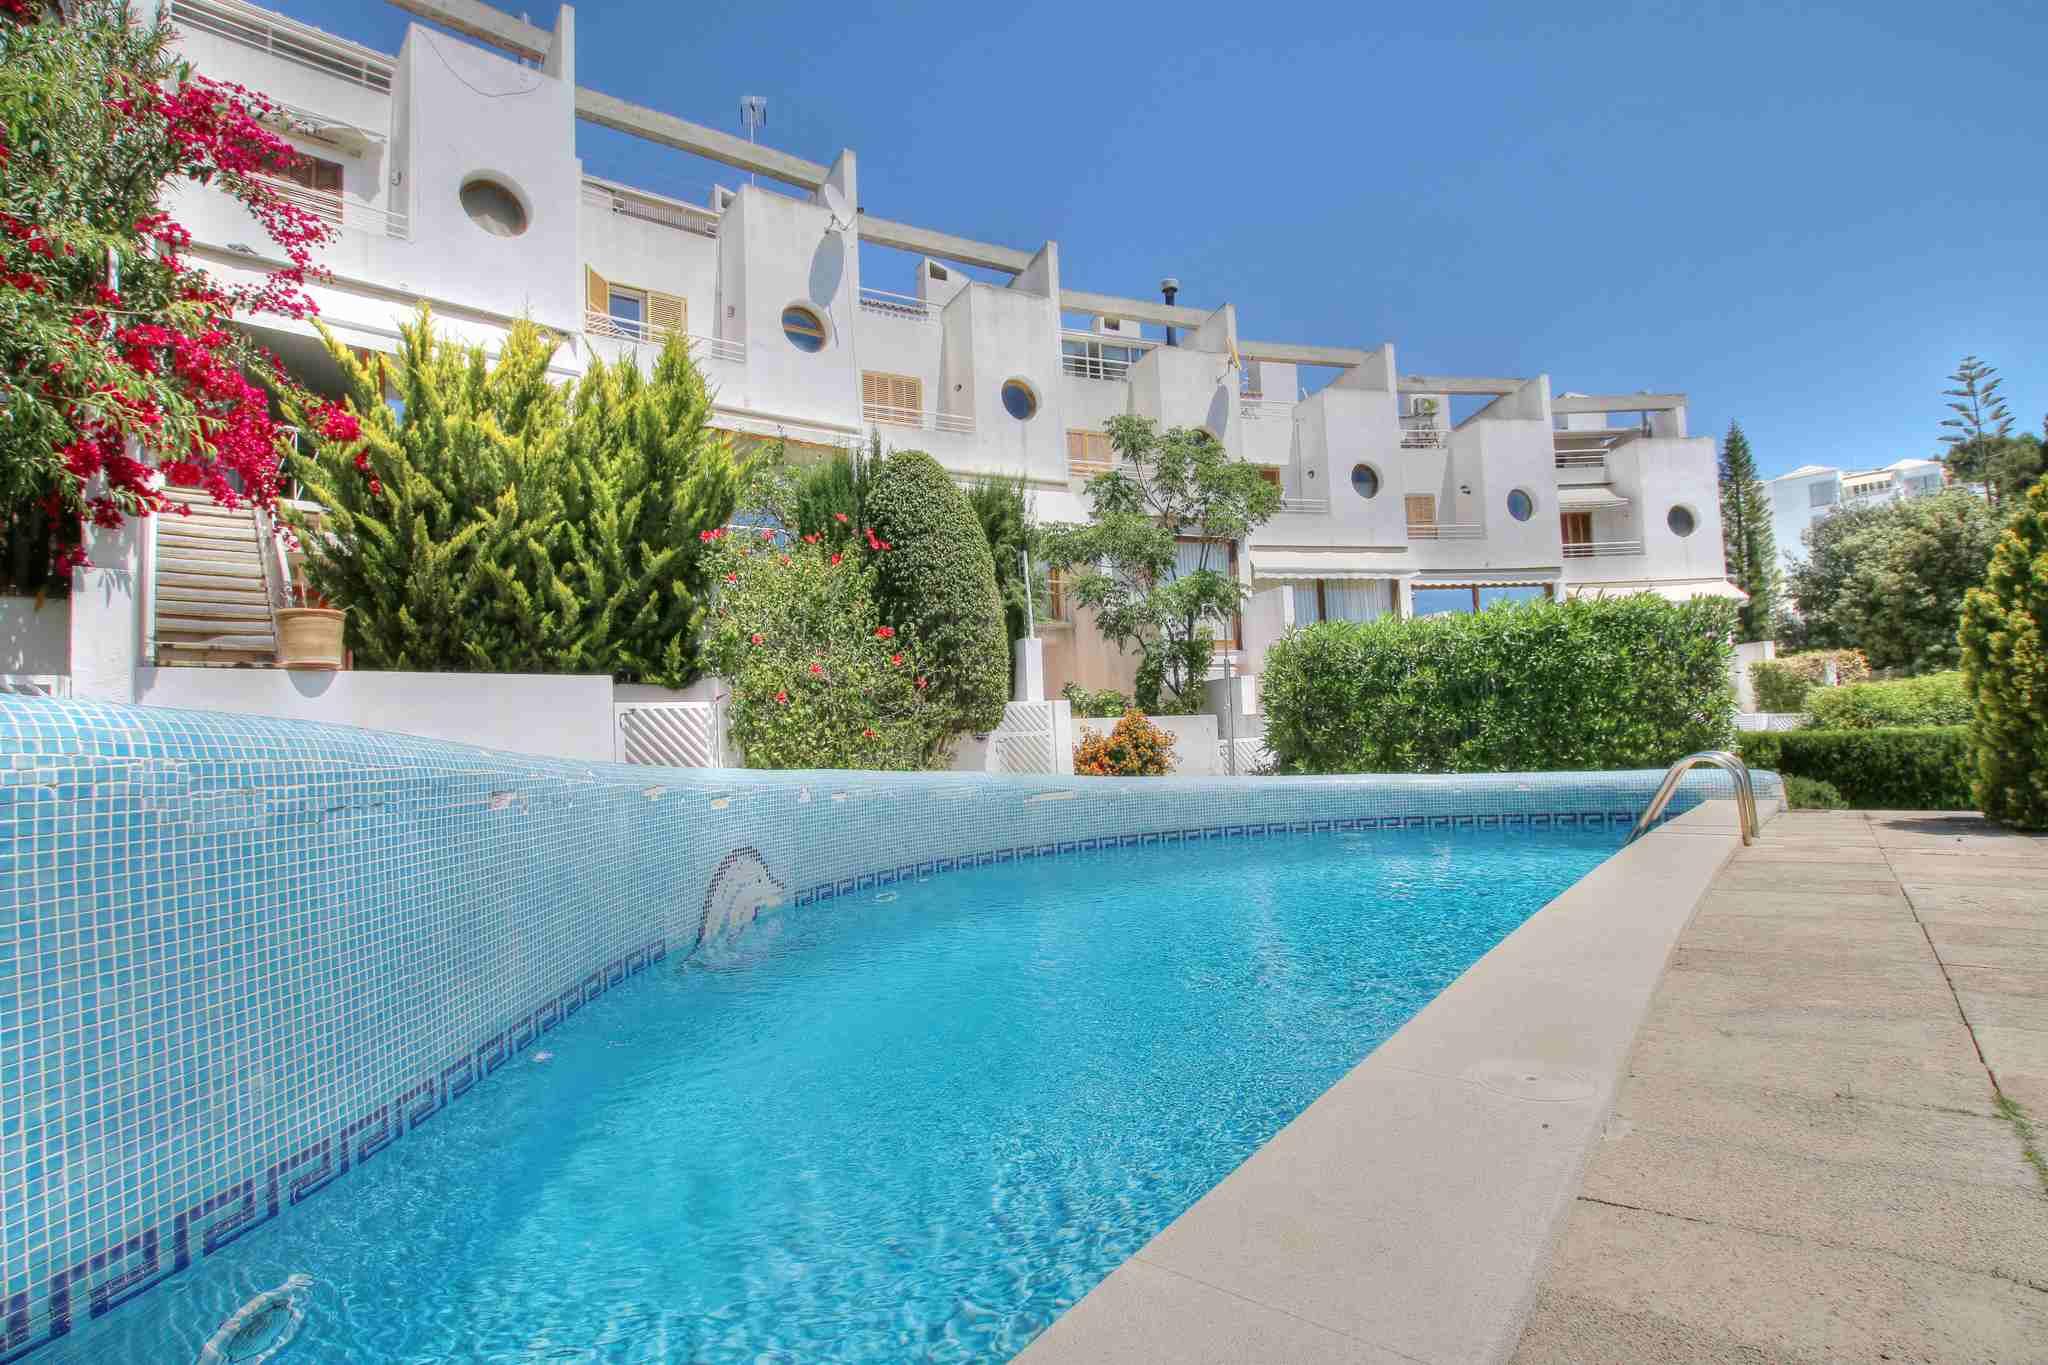 Modern townhouse for rent in La Bonanova @ Palma de Mallorca